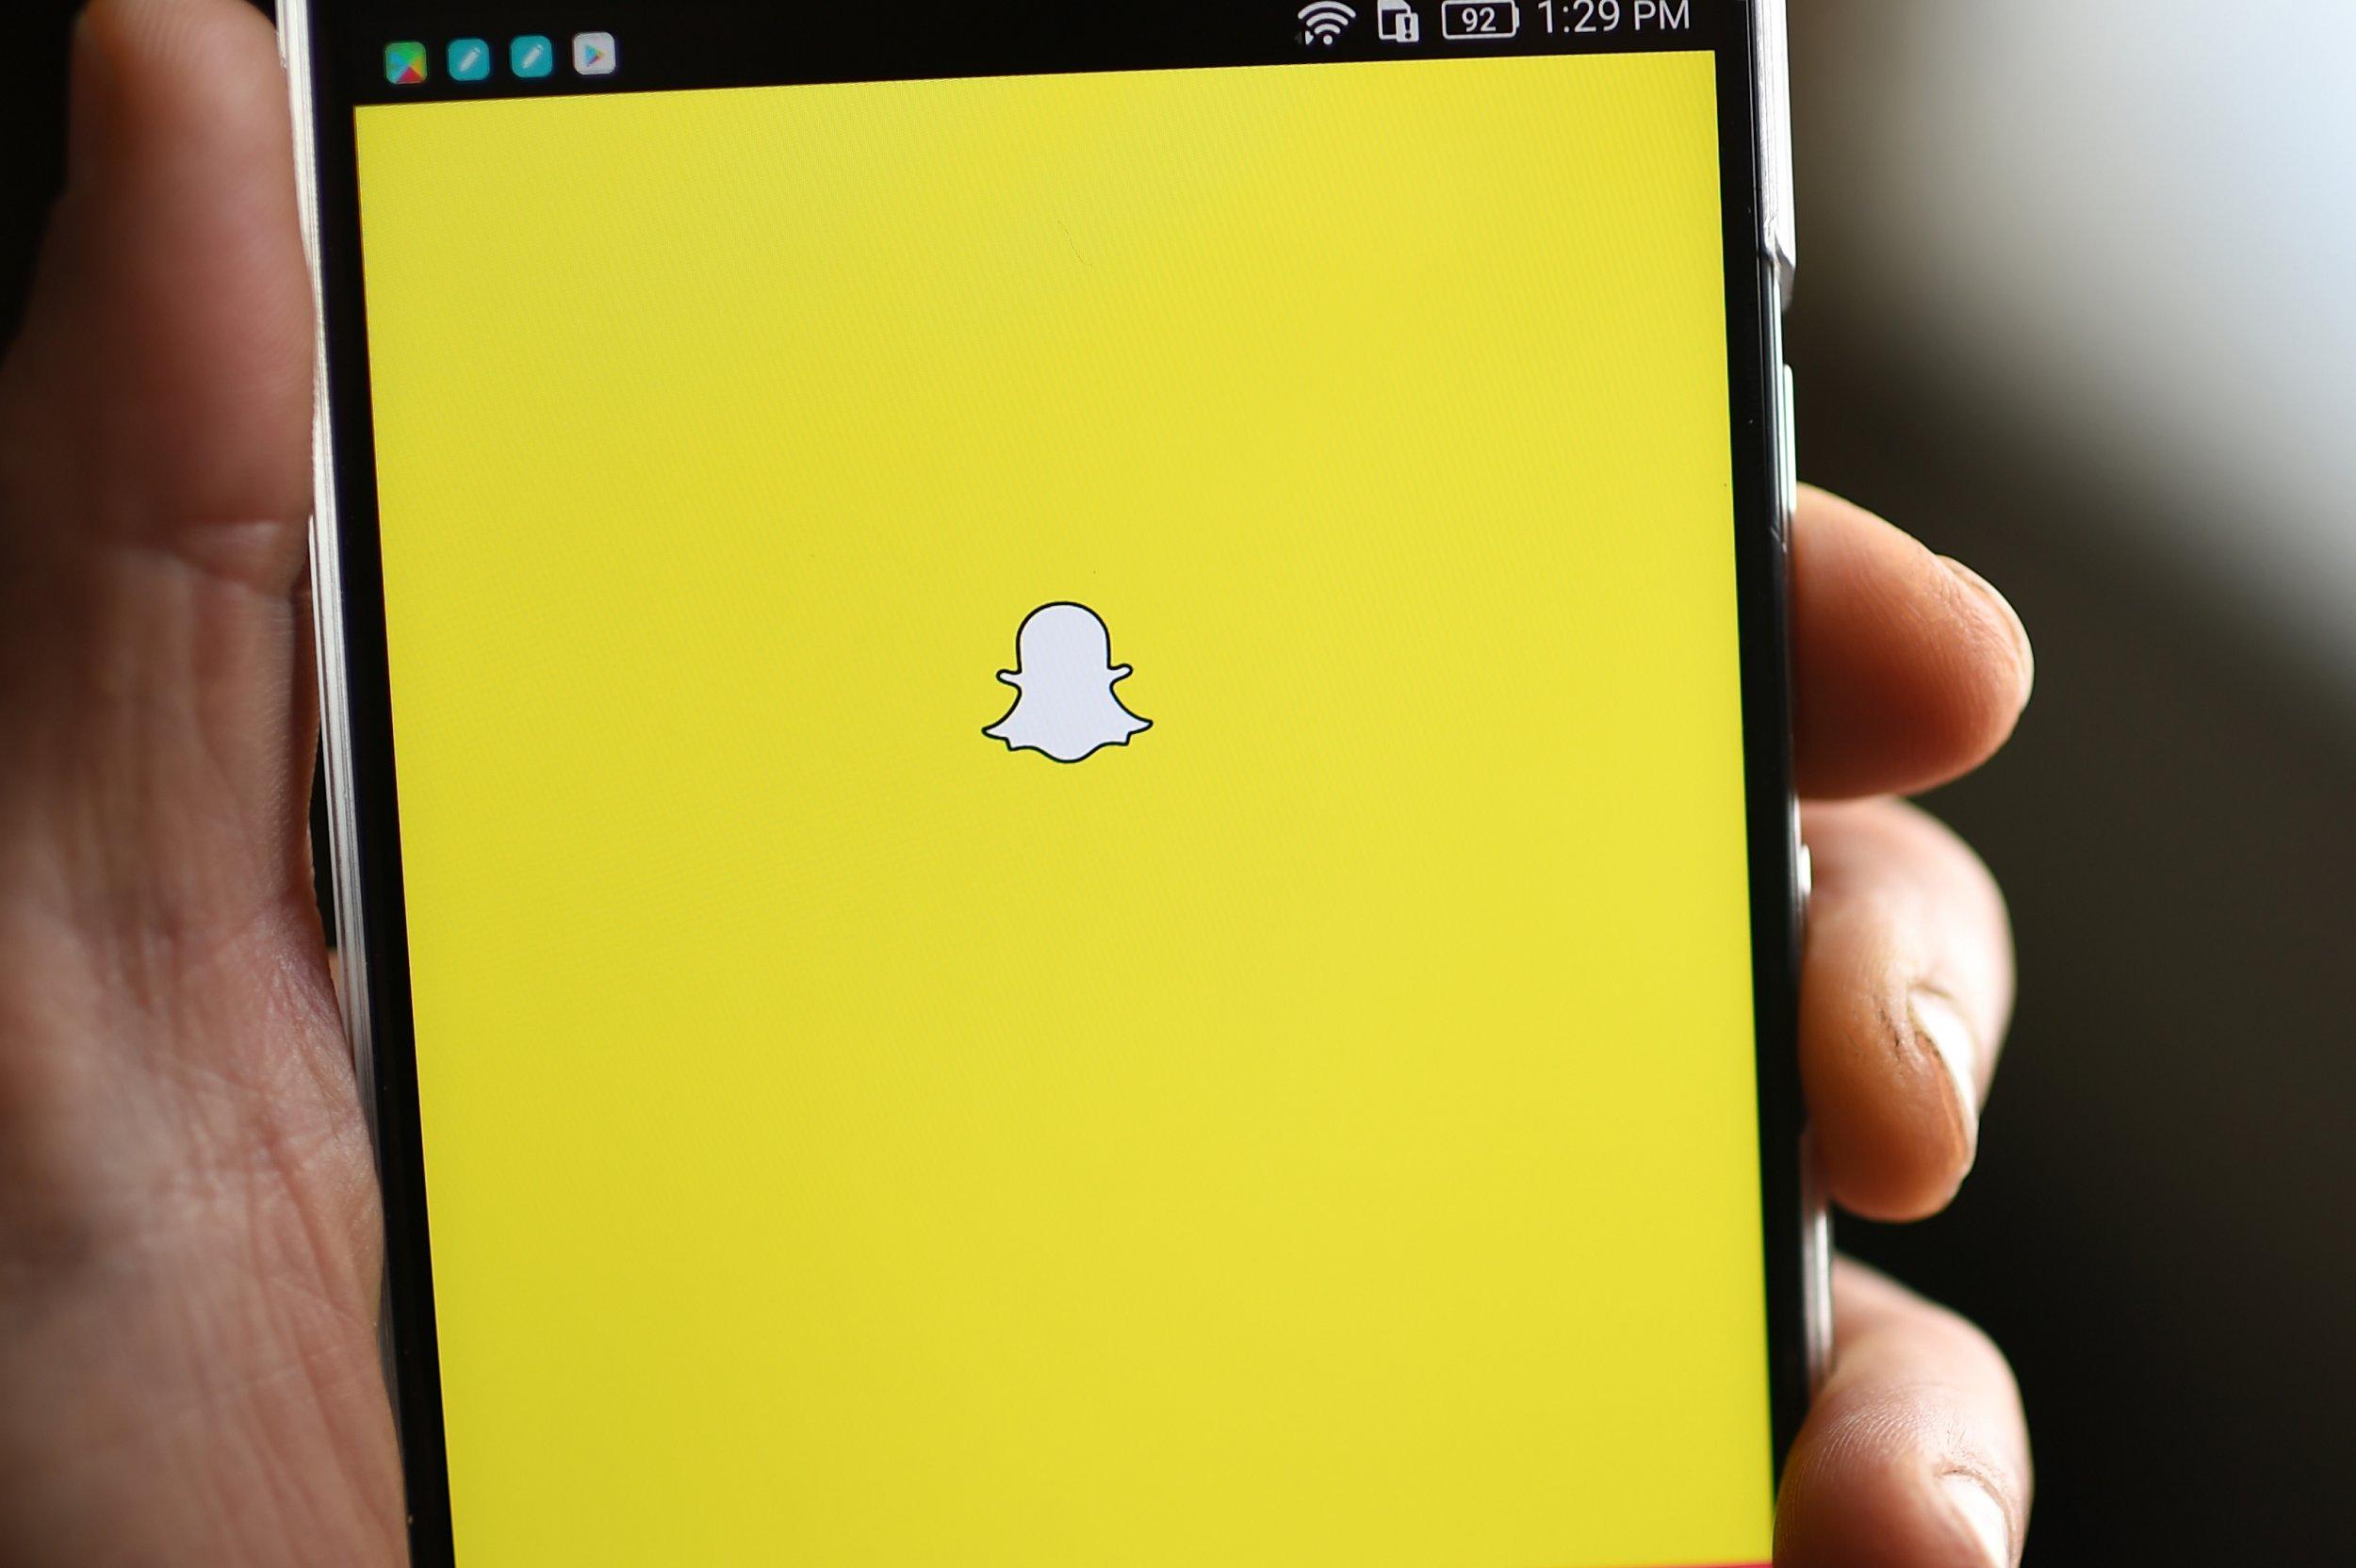 snapchat on screen down